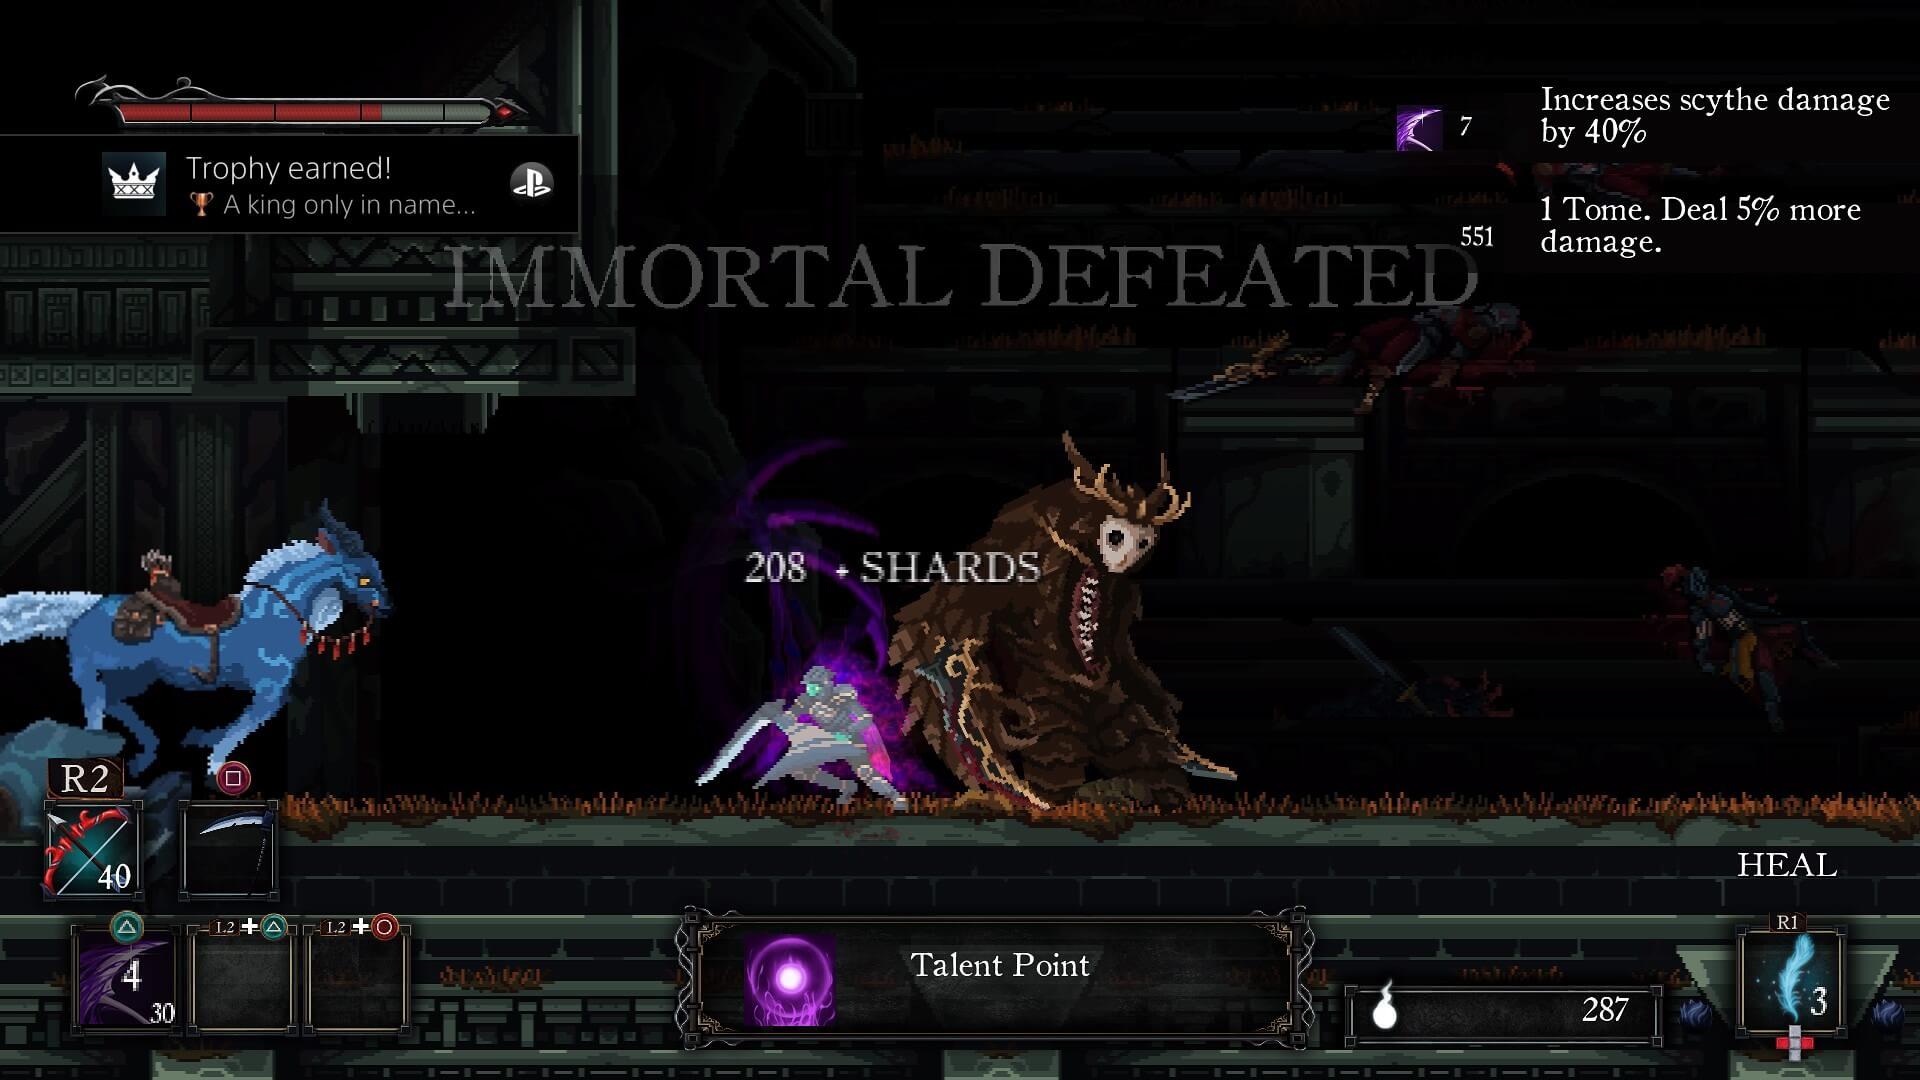 Death's Gambit, White Rabbit, Adult Swim, Delfos